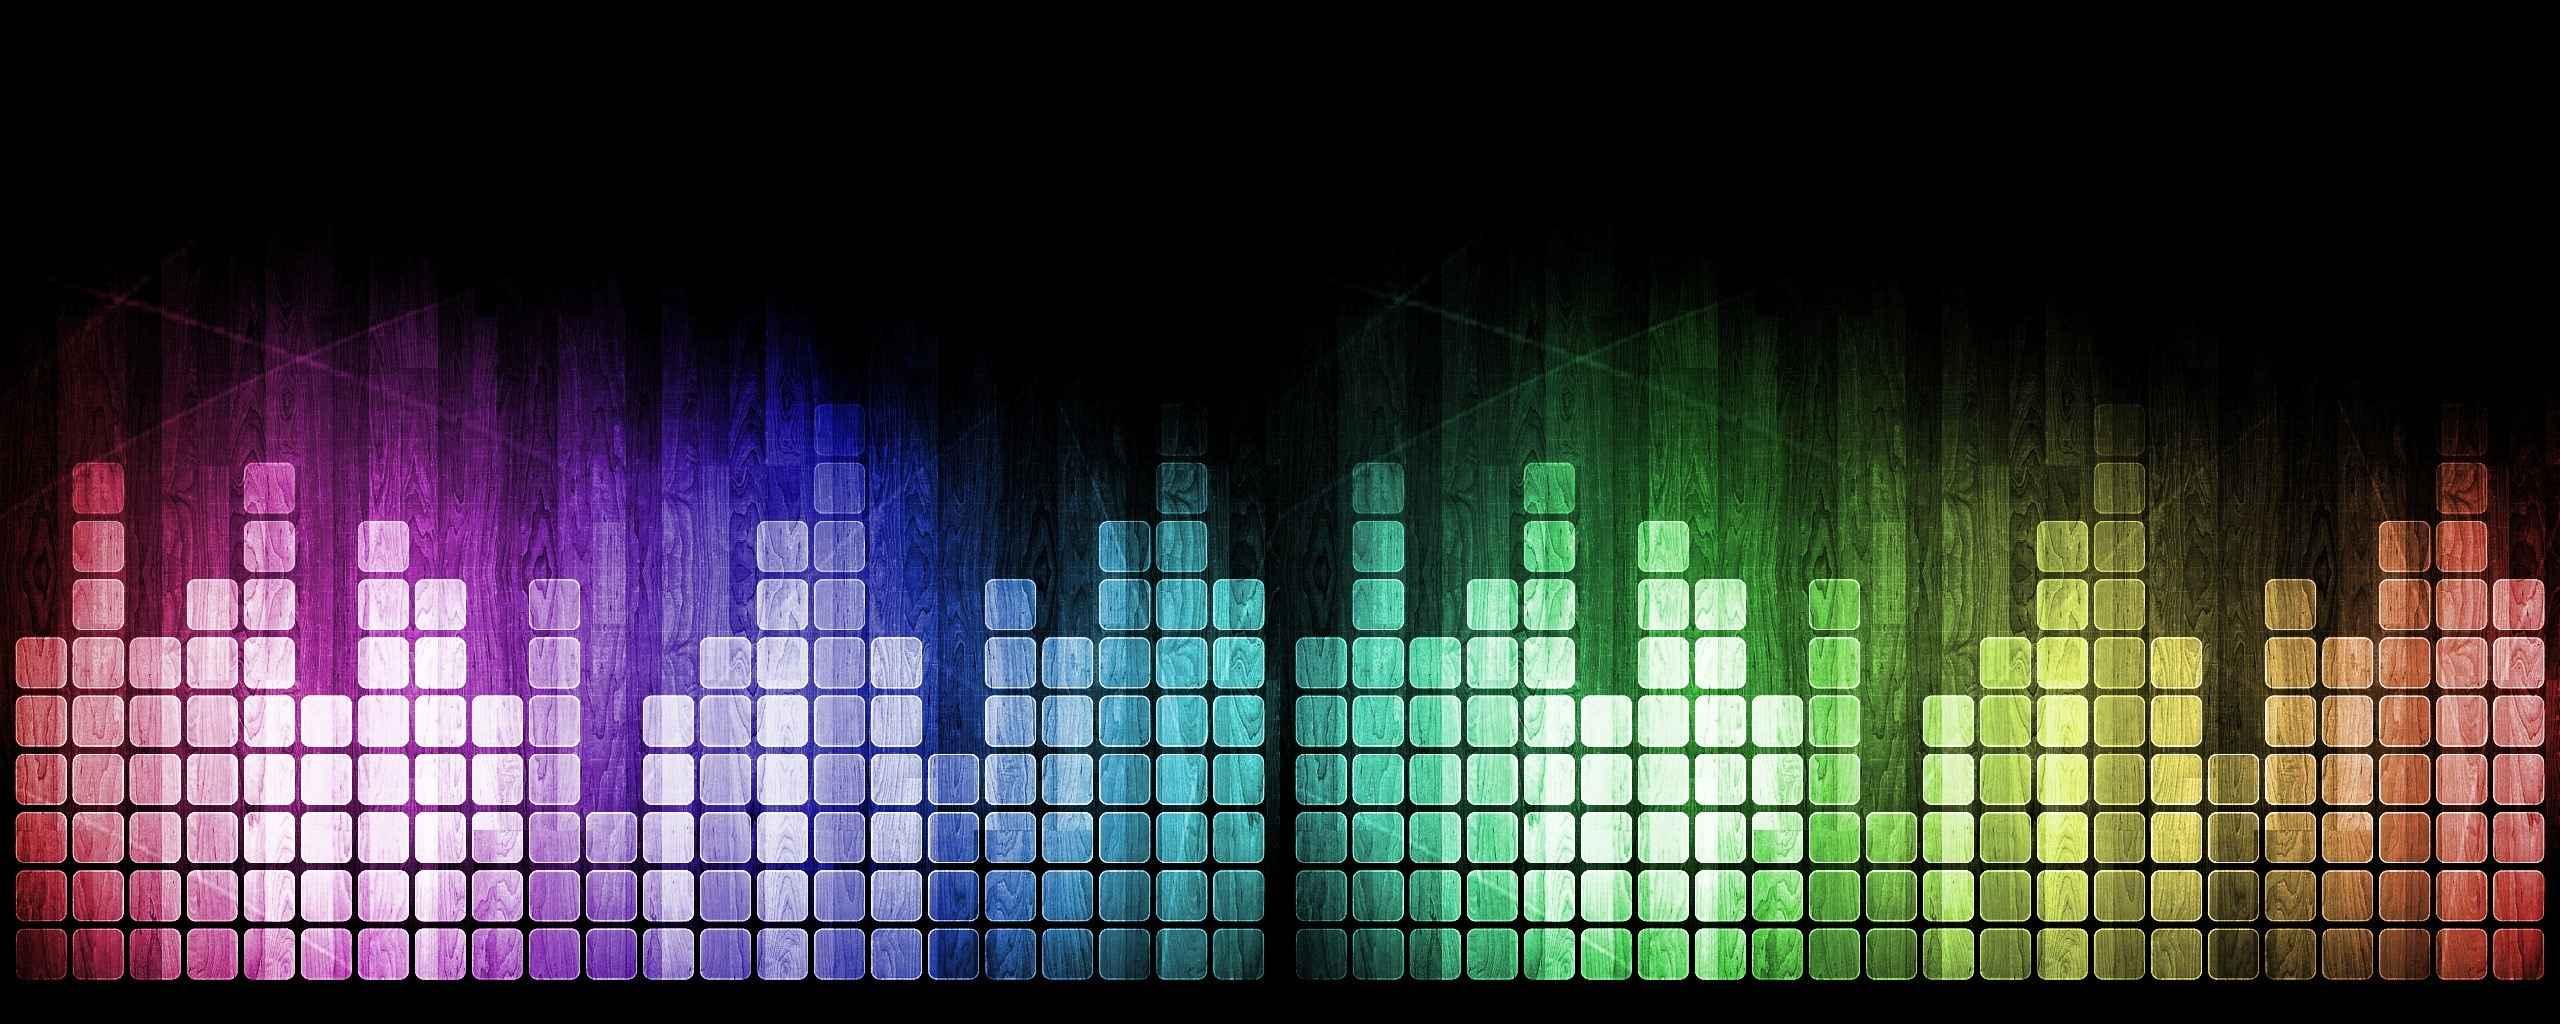 Music Background Wallpaper 070